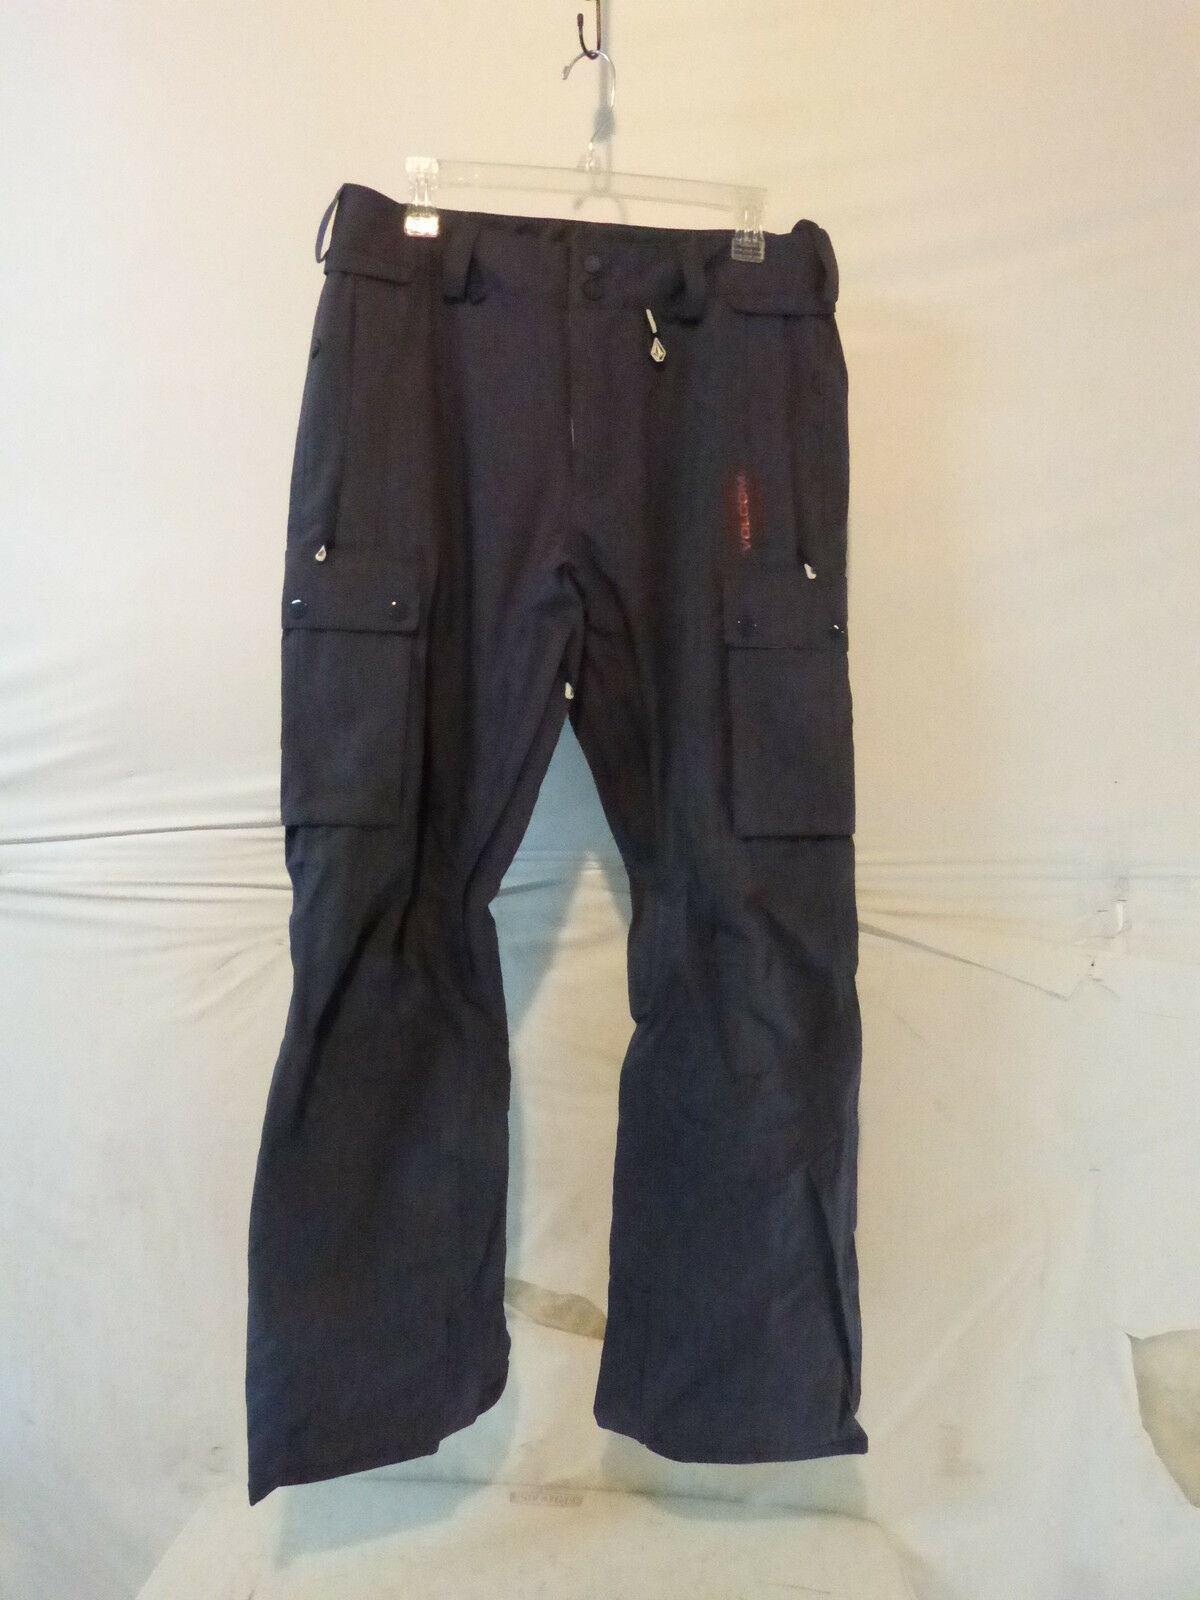 Volcom EX 4-Way Pant - Men's Medium Retail